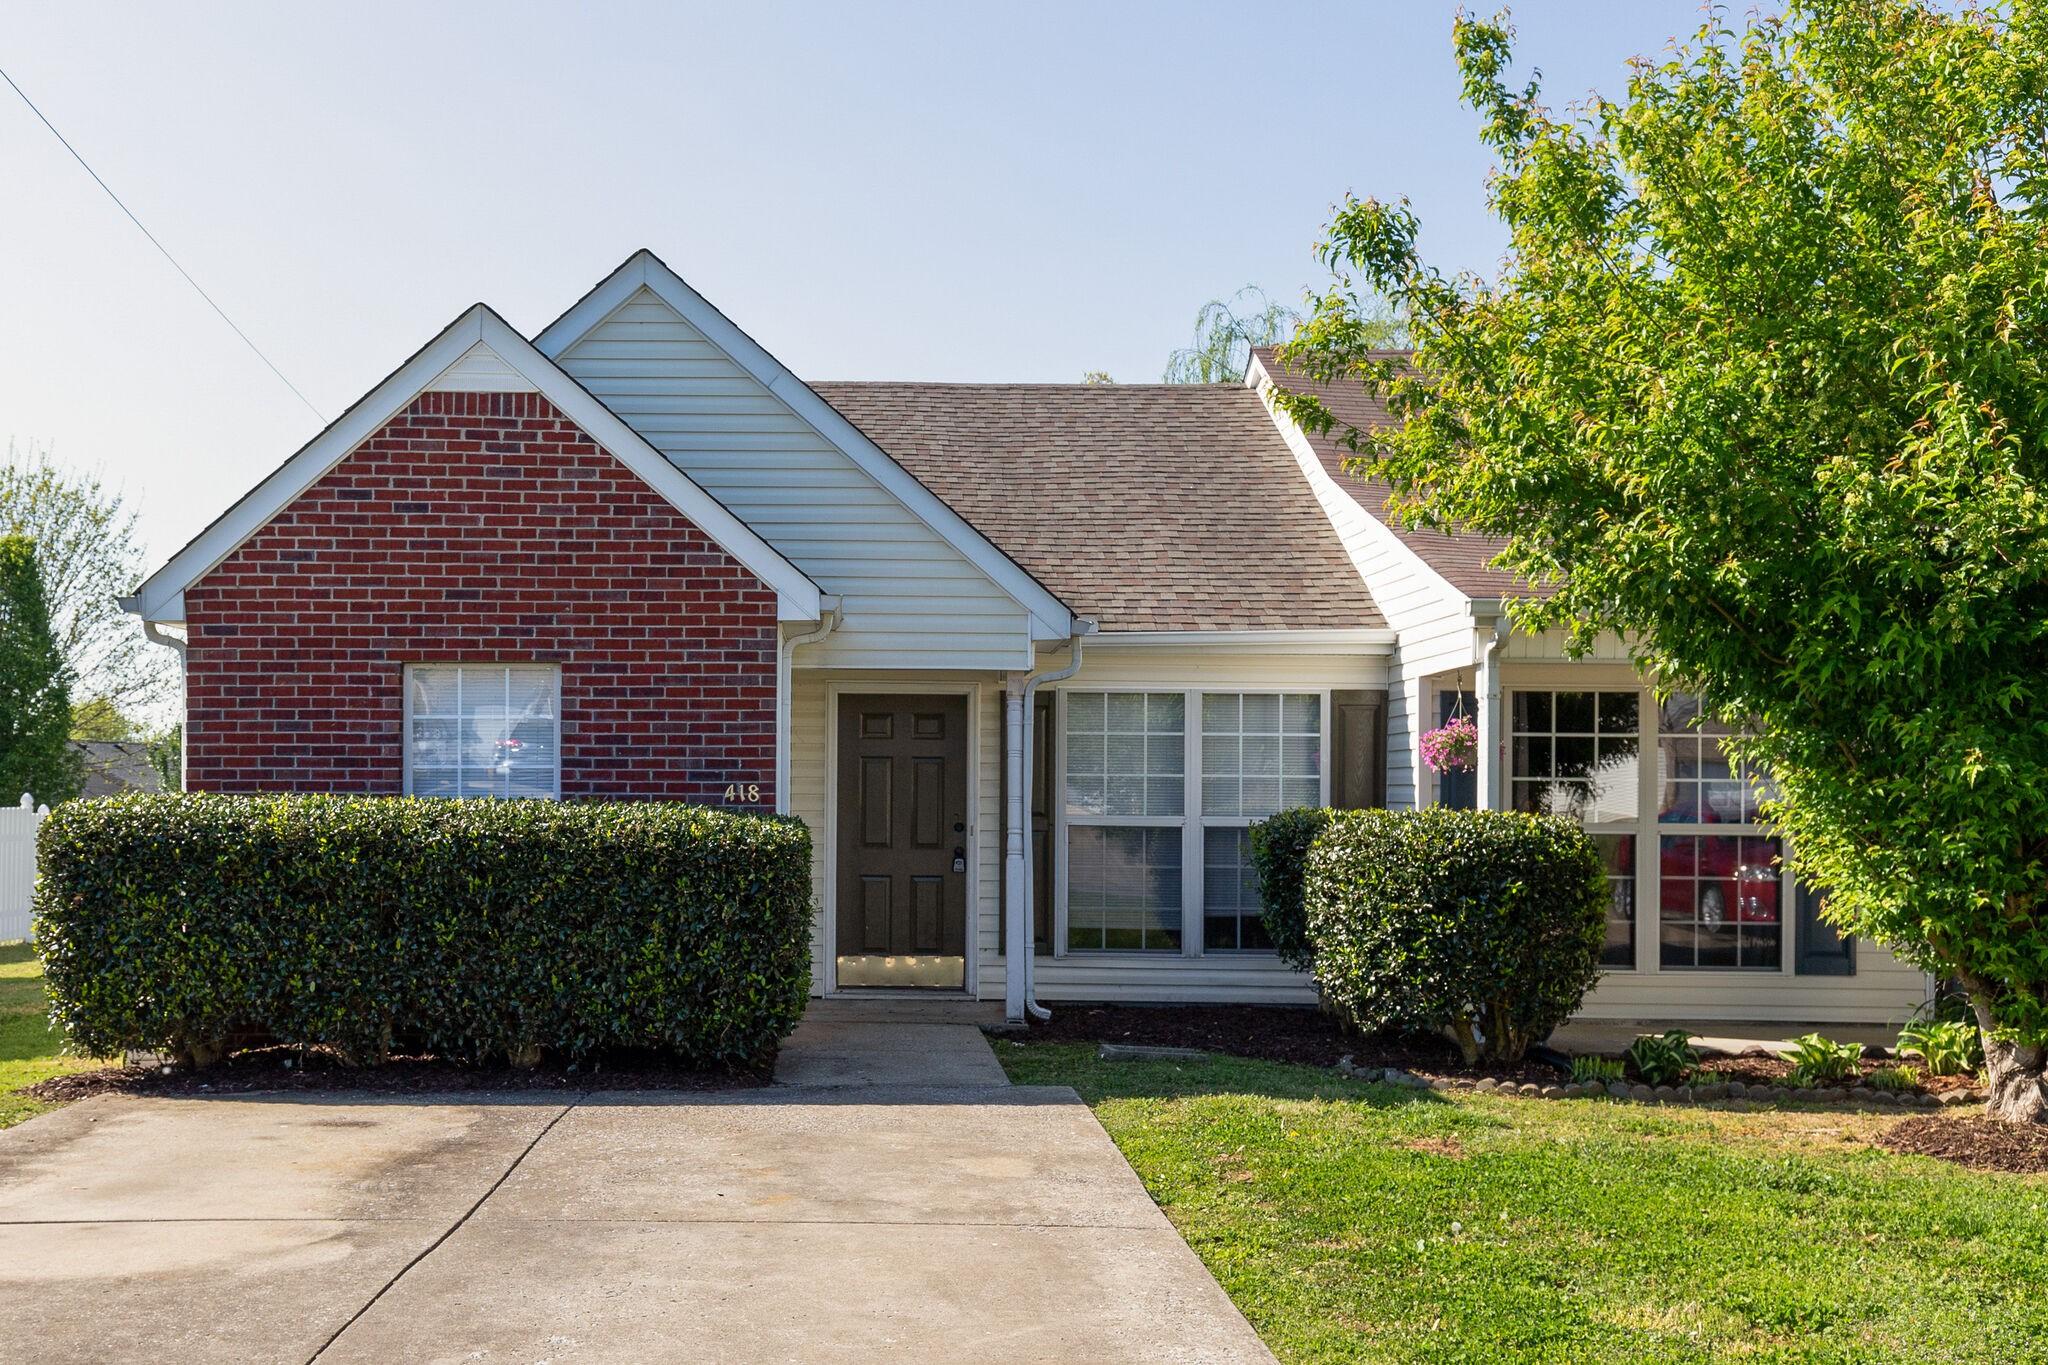 418 Keswick Ct Property Photo - Smyrna, TN real estate listing